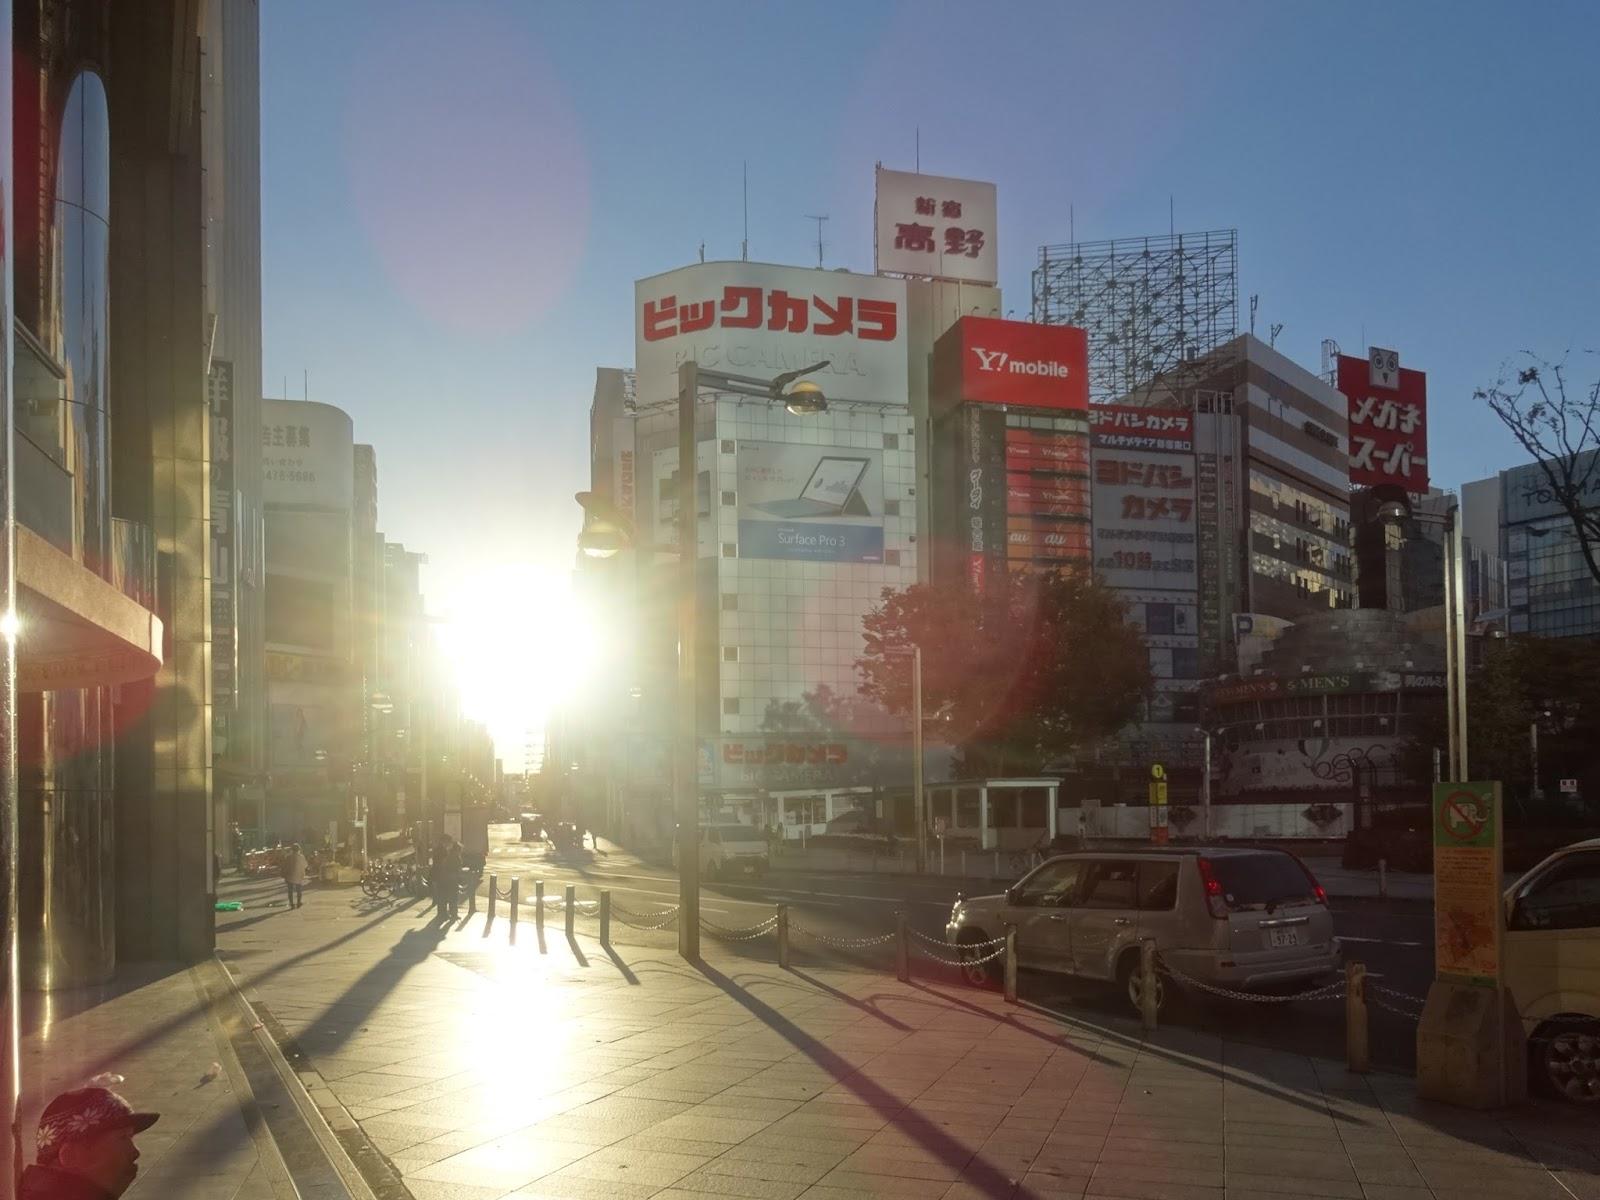 朝日,新宿〈著作権フリー画像〉Free Stock Photos